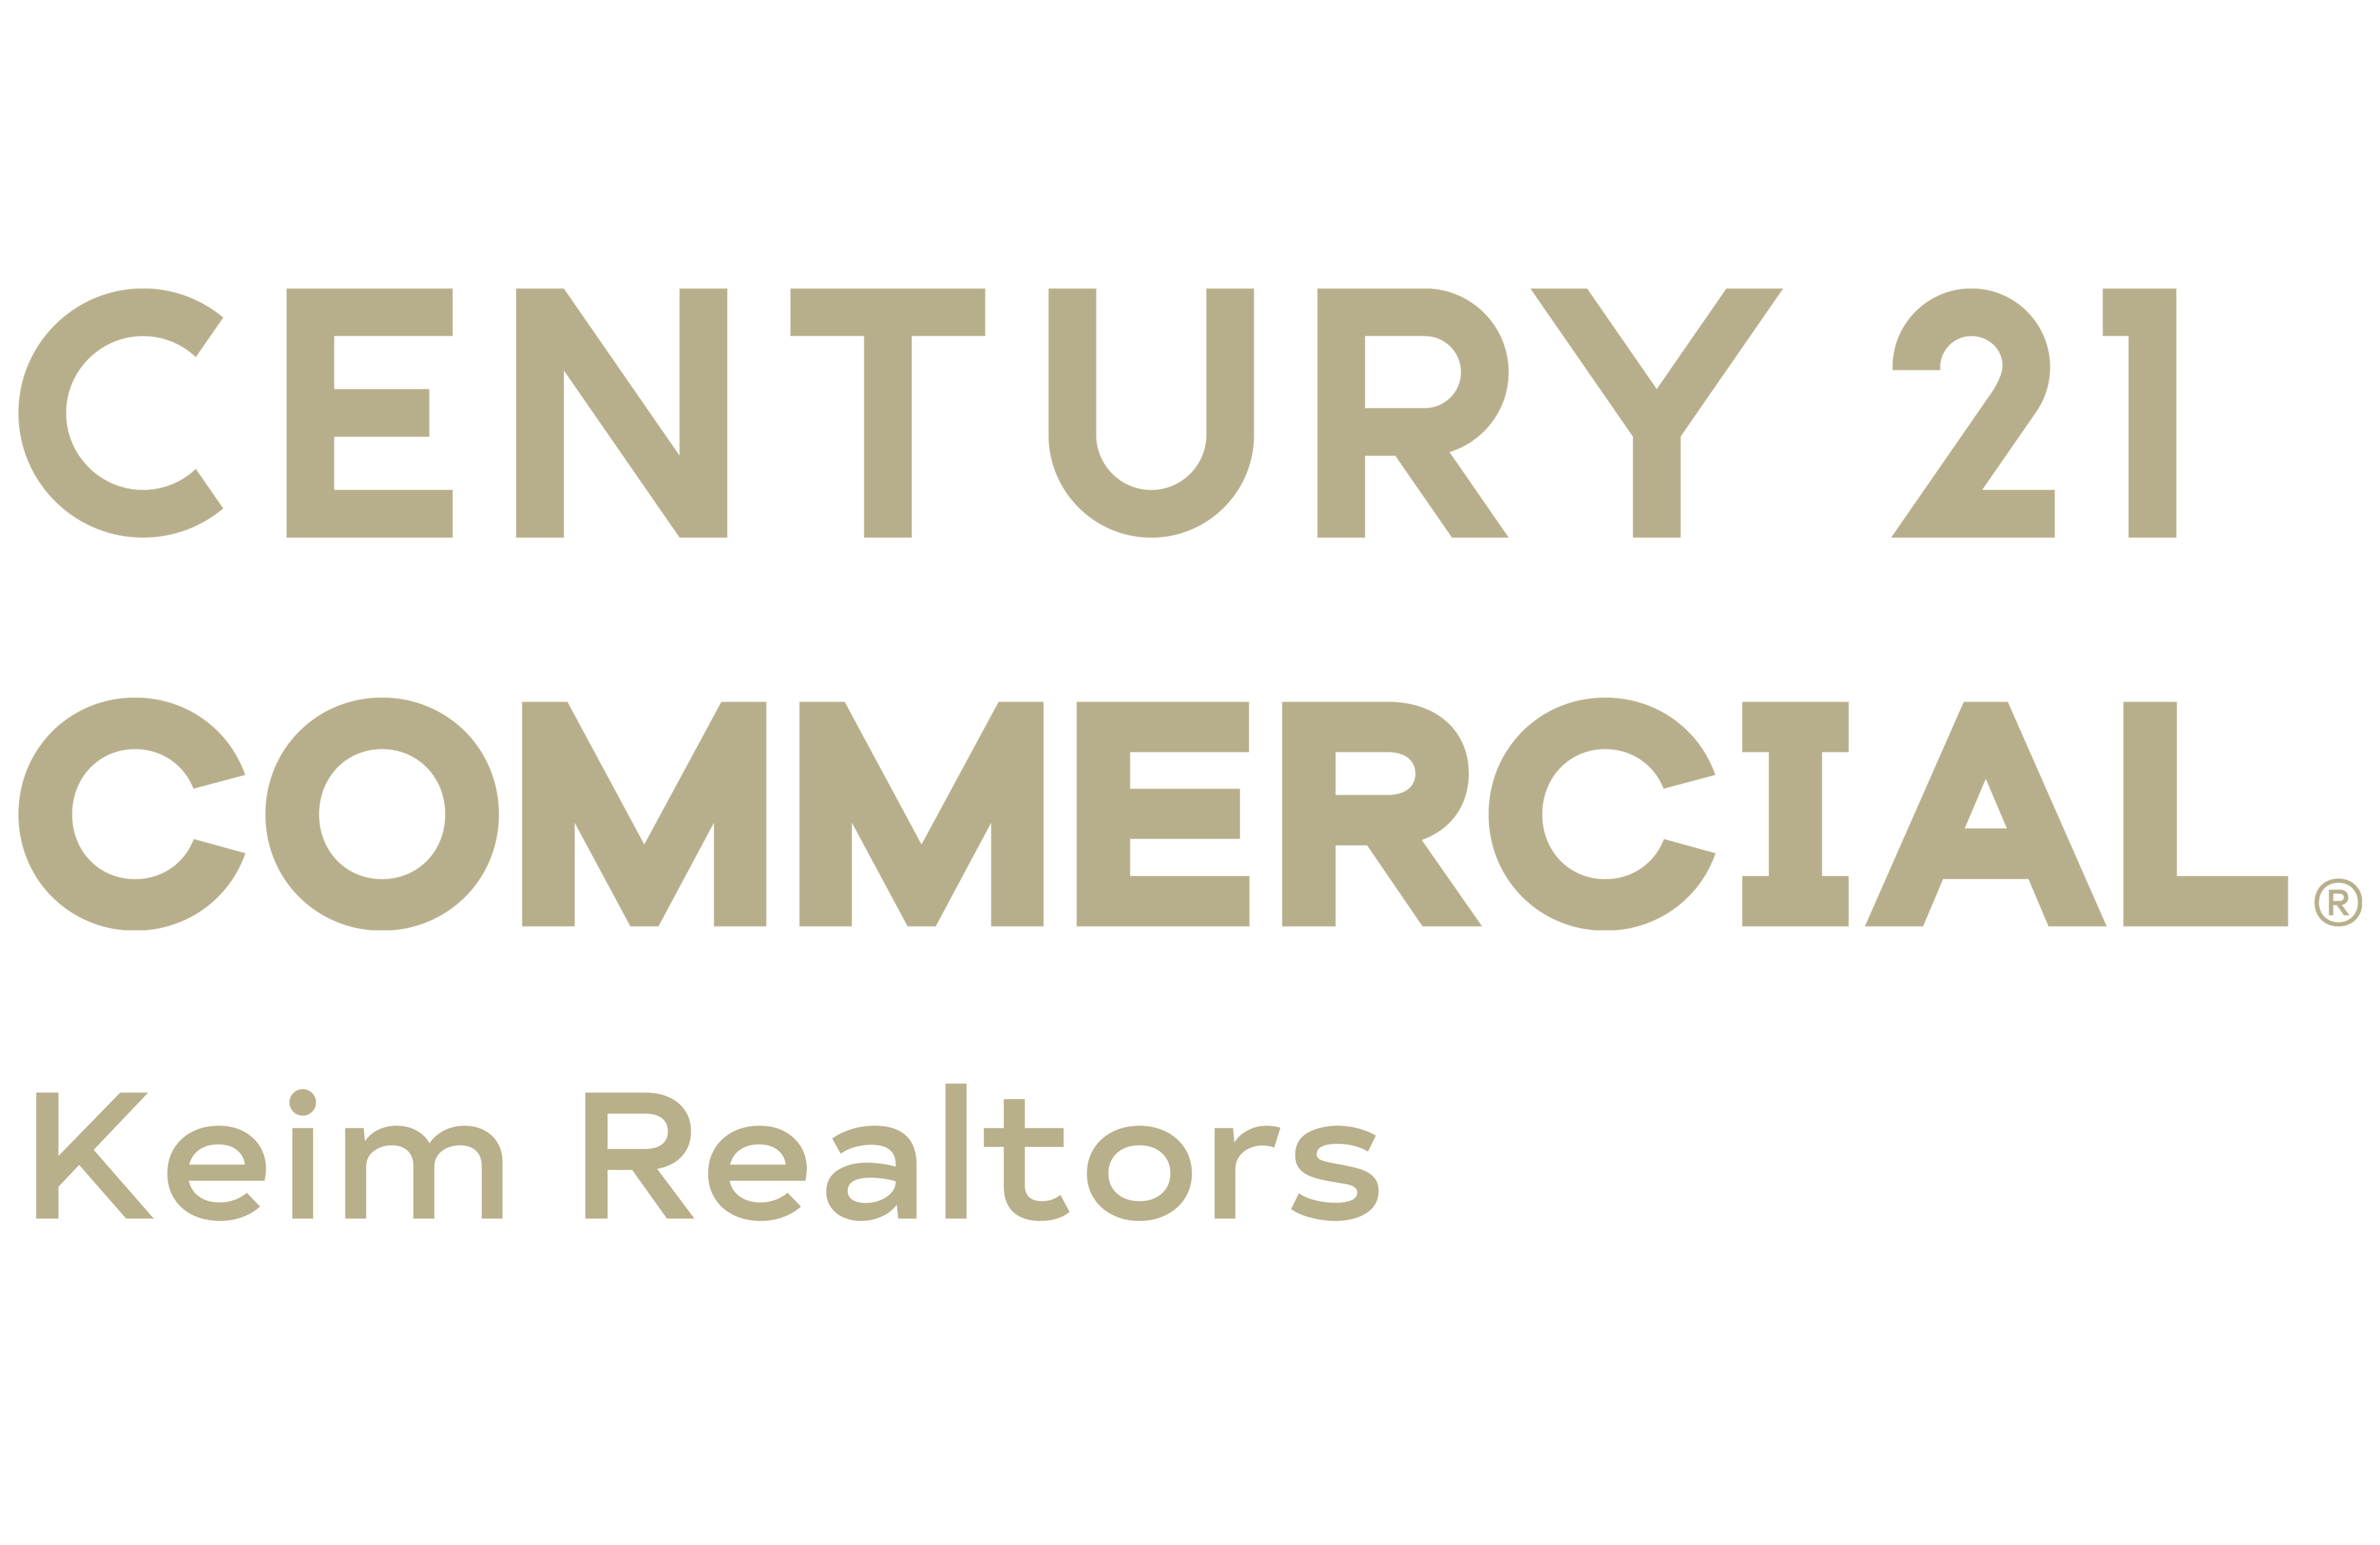 Robert Cornelius of CENTURY 21 Keim Realtors logo